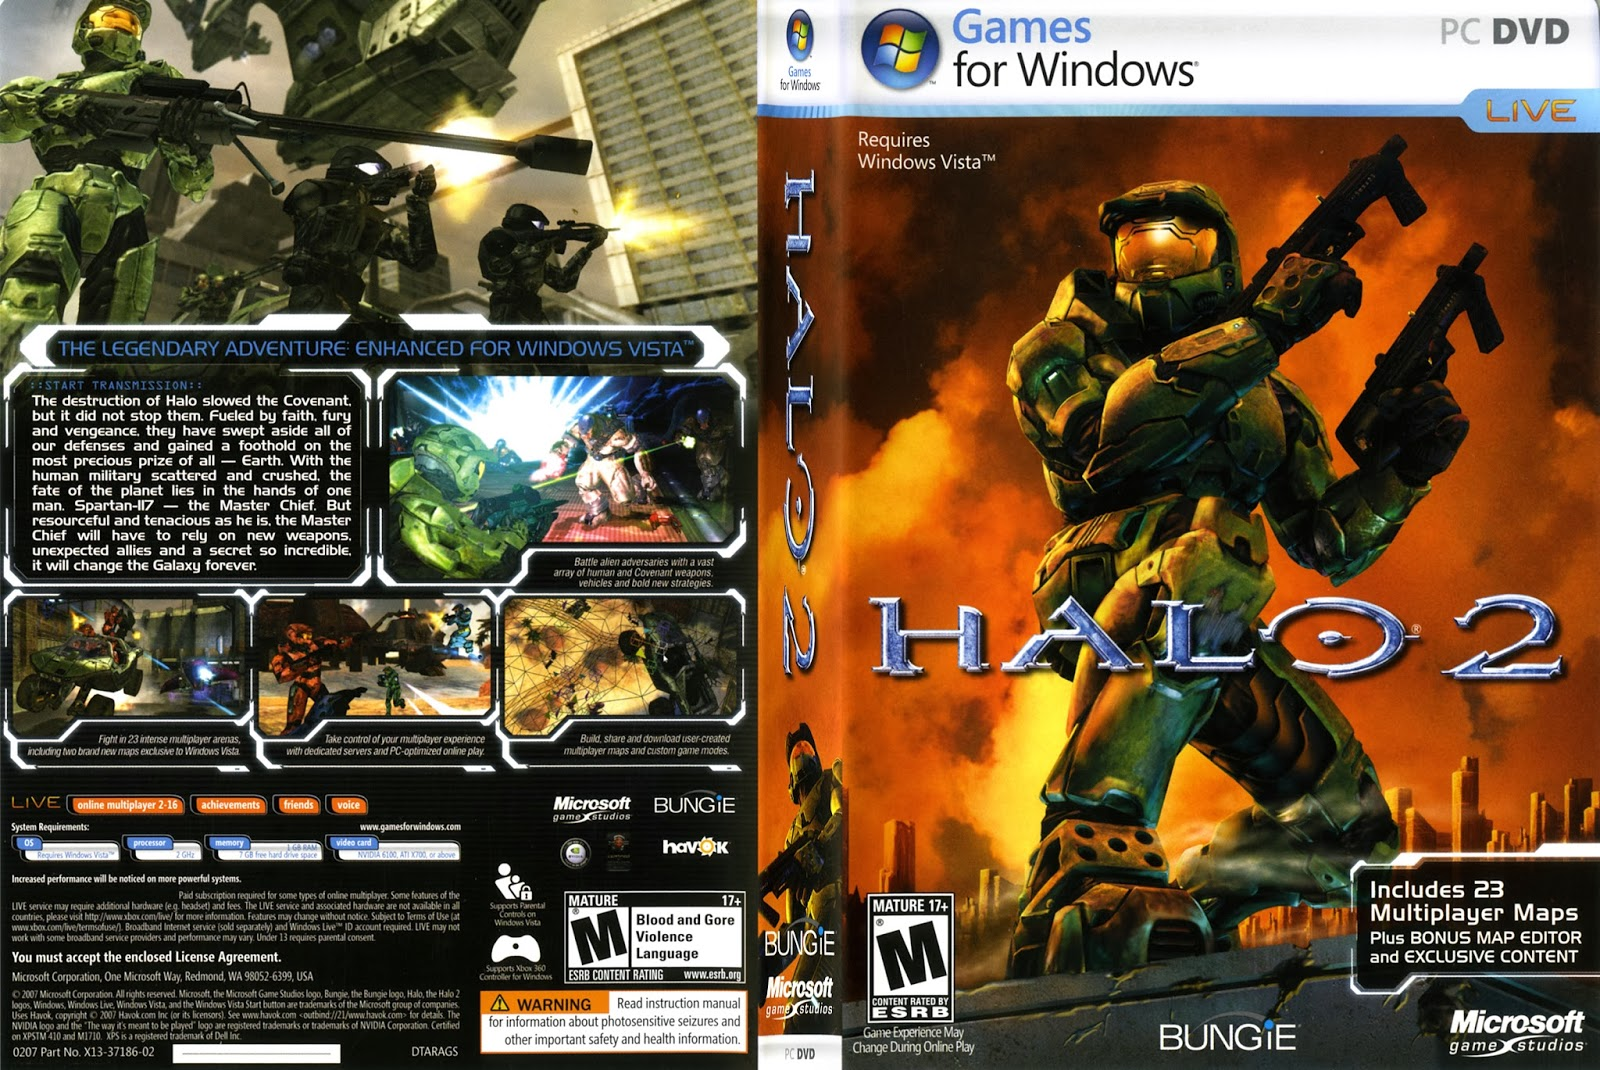 Halo 2 PC DVD Capa